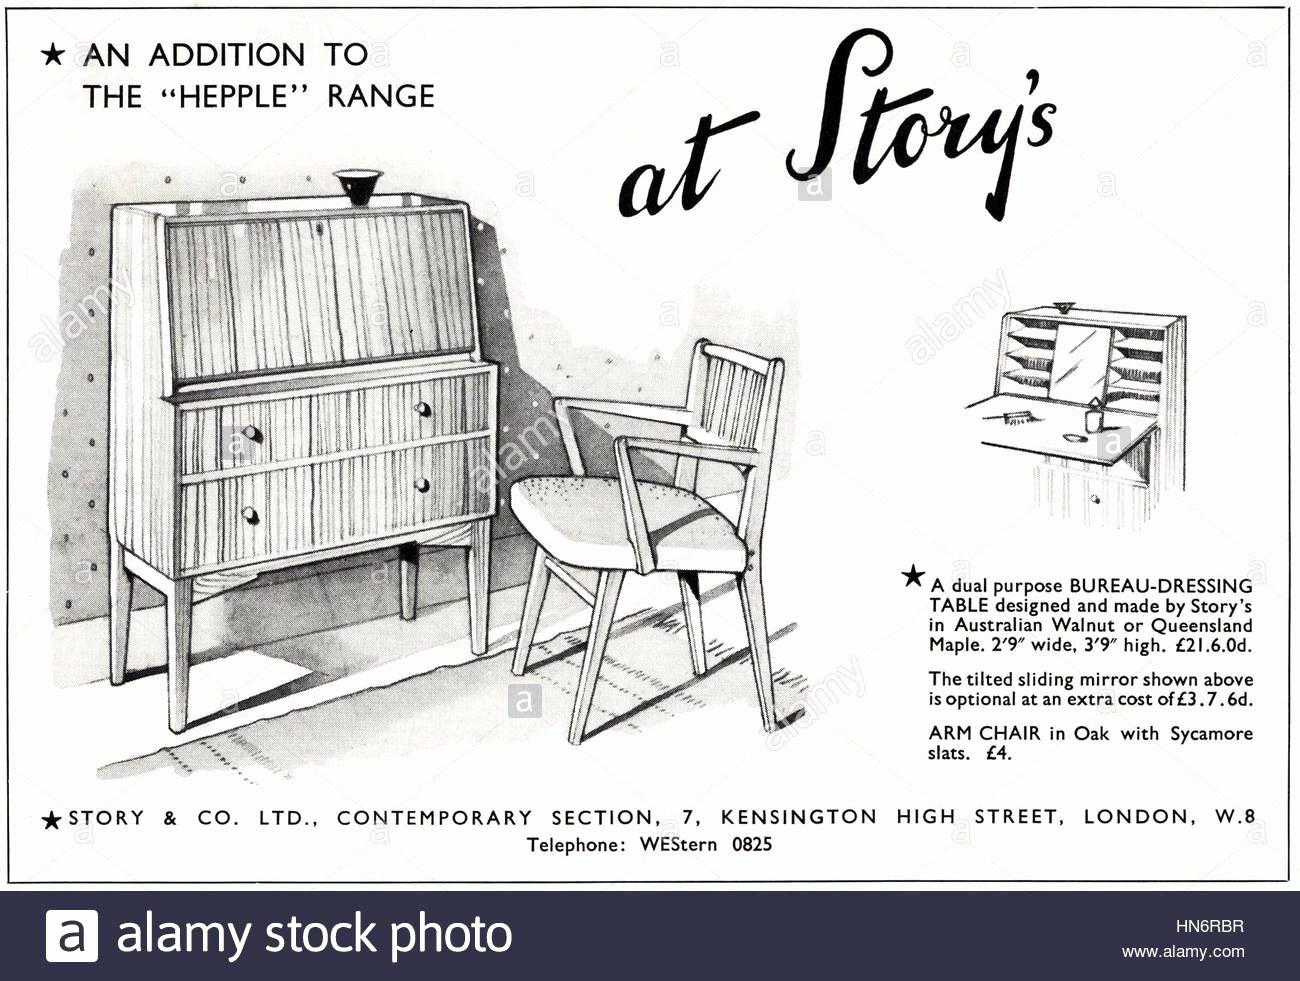 leroy merlin meubles de jardin meuble salle de bain ulysse of leroy merlin meubles de jardin